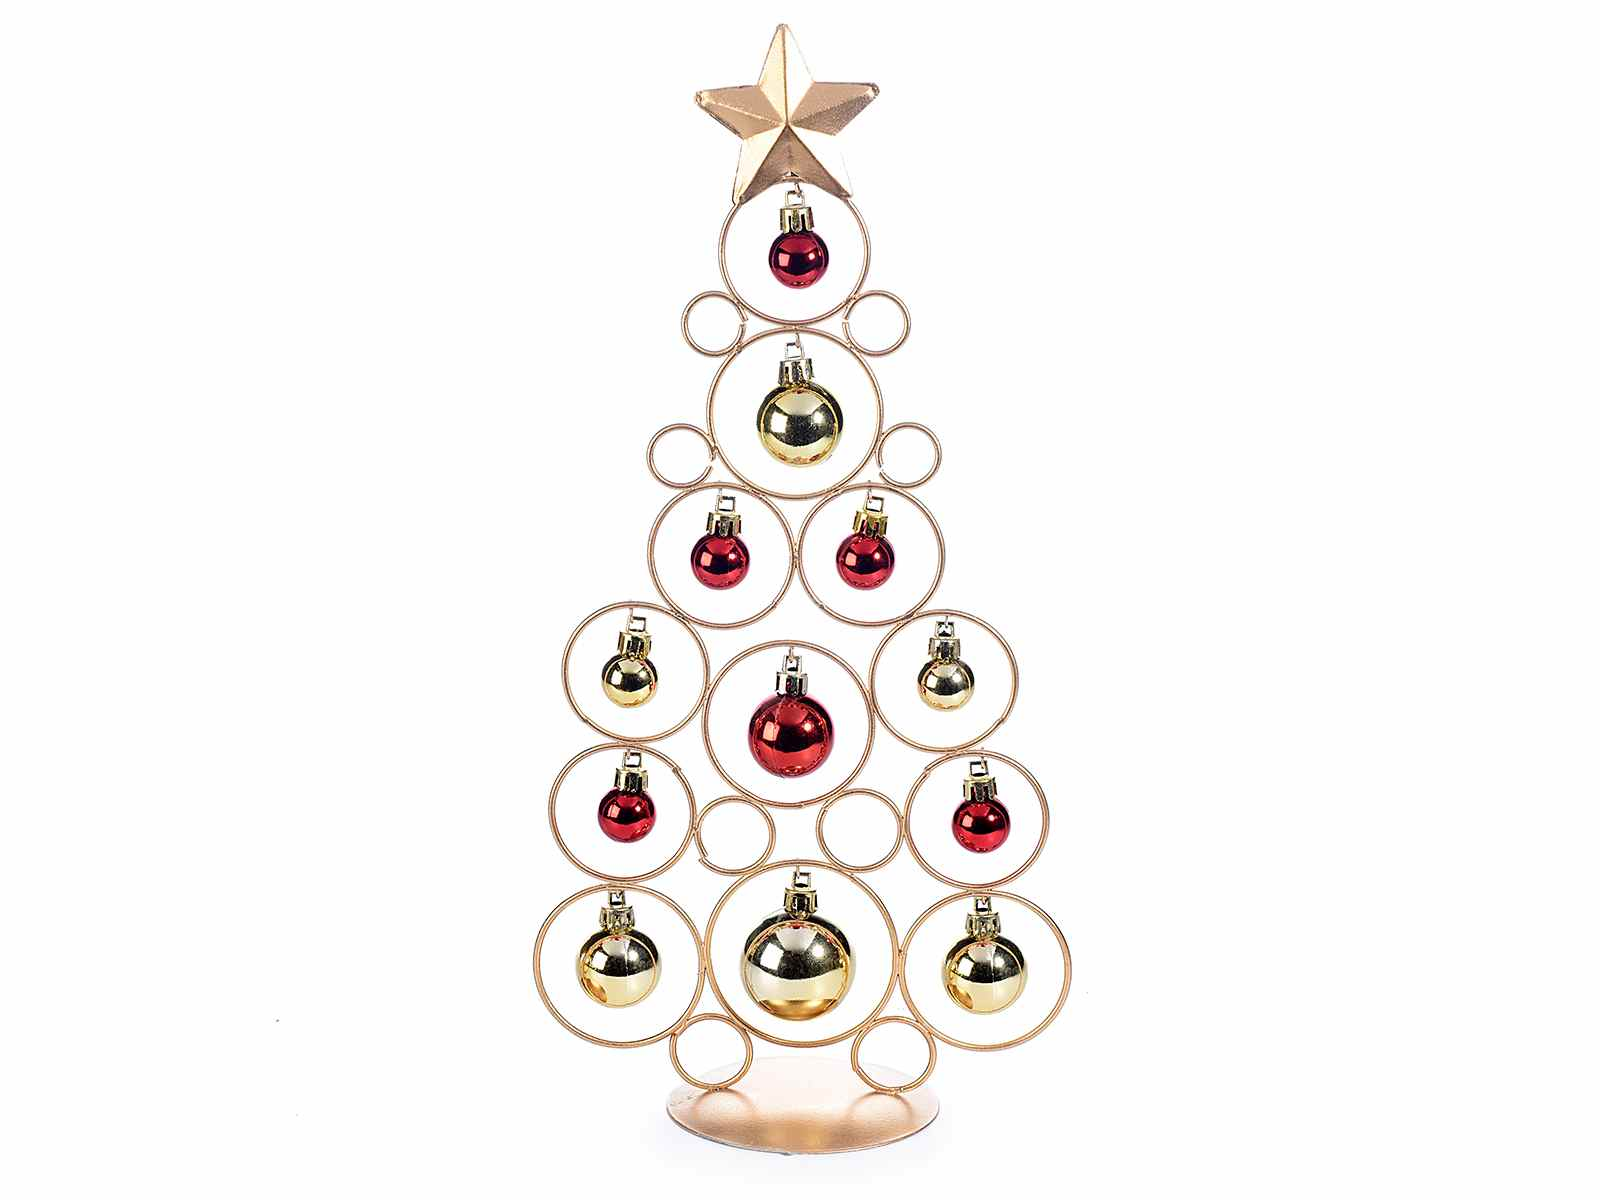 sapin noel metal Metal gold Christmas tree with 12 balls (53.19.25)   Art From Italy sapin noel metal